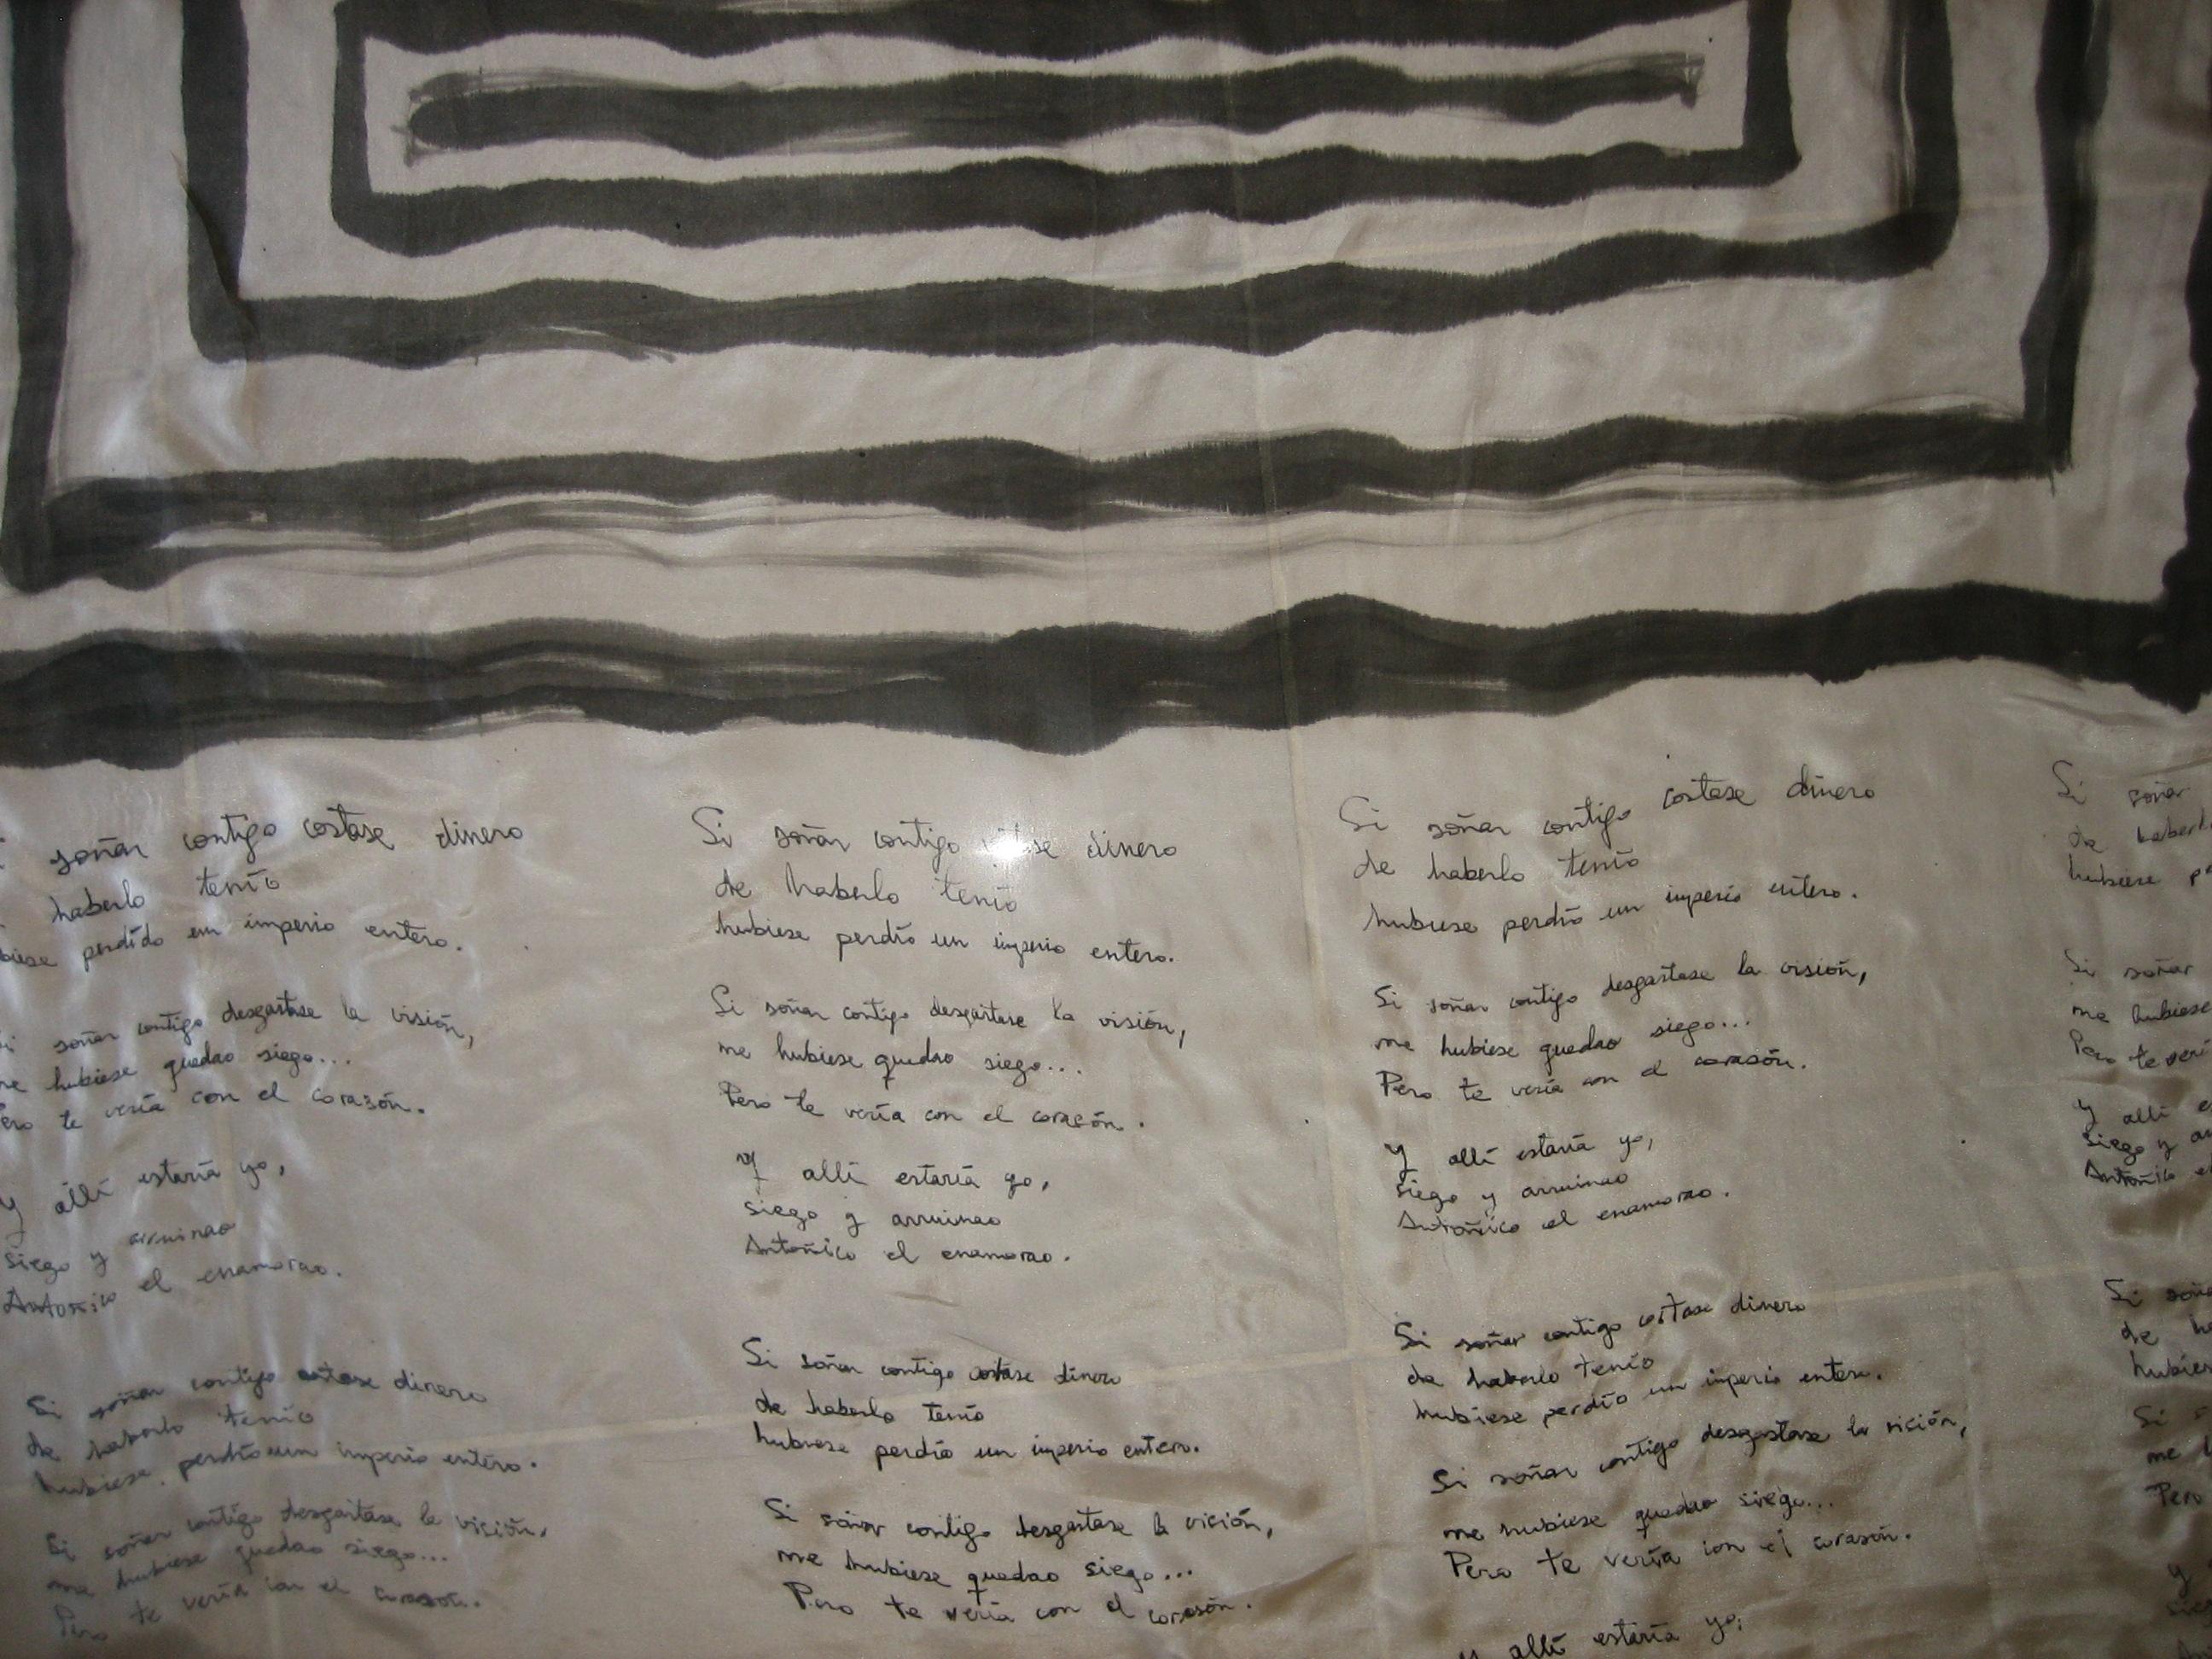 Pañuelo Poesía Toni Alcolea